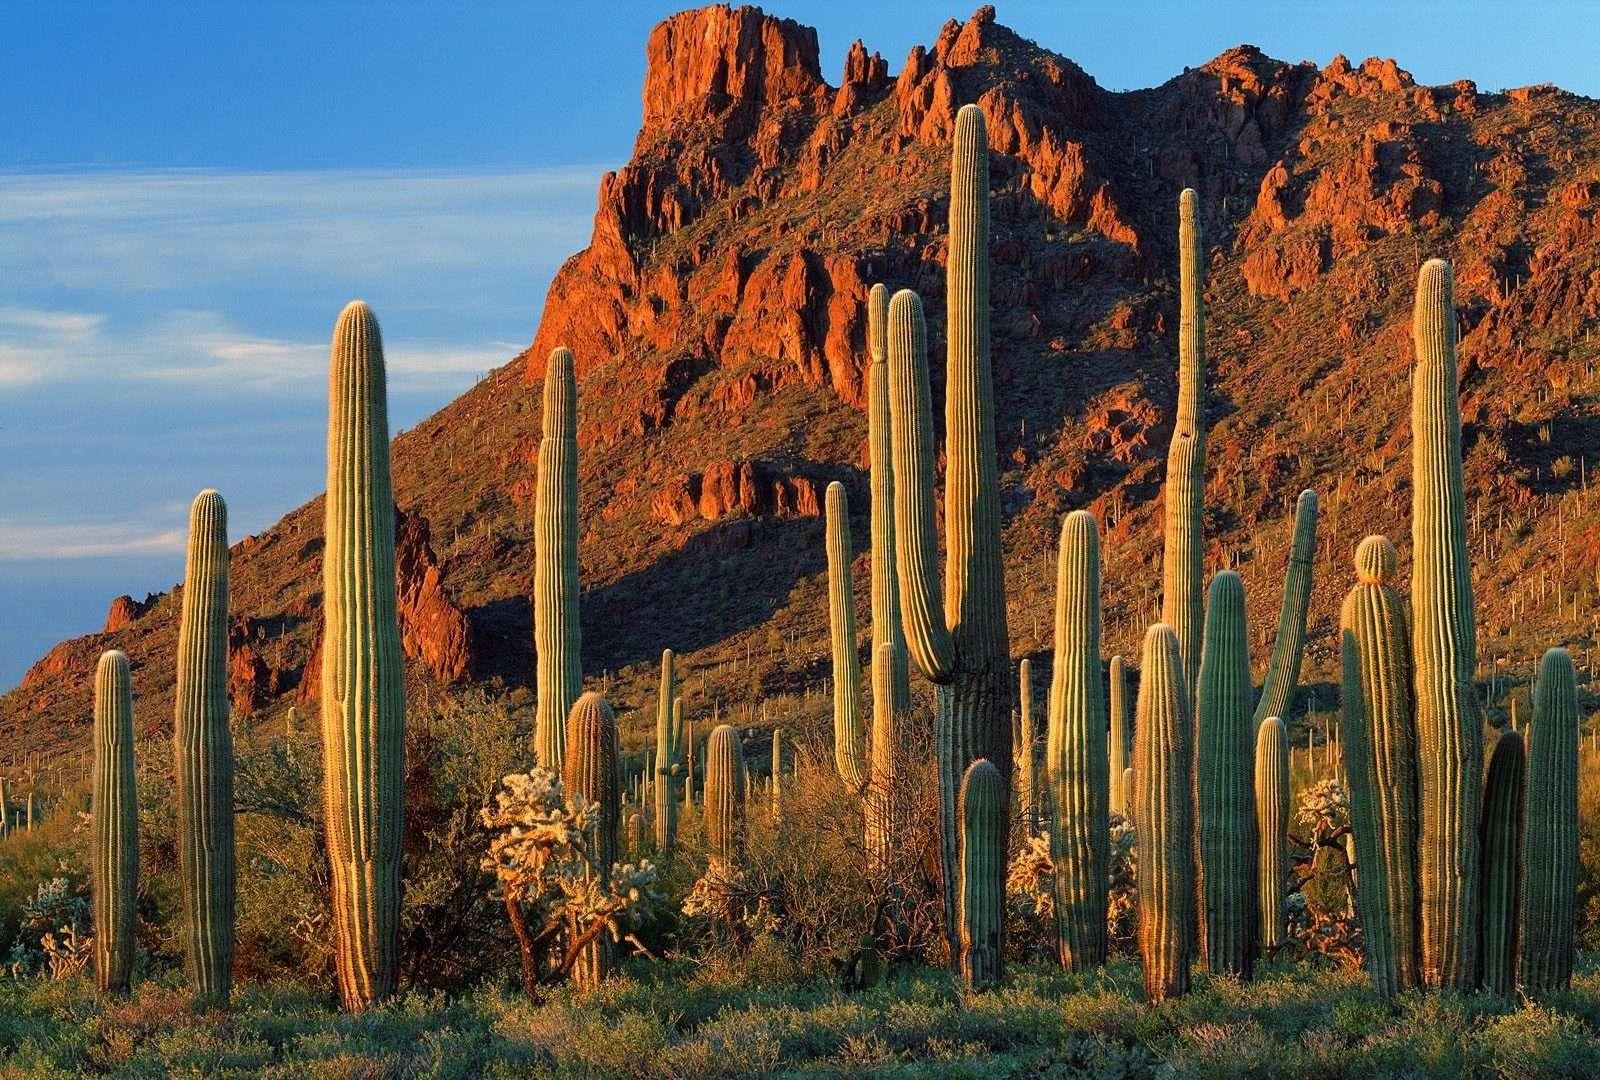 Canyon cactus light blue sky desert nature day daytime brown plant clouds green rocks saguaro photo 1600x1080